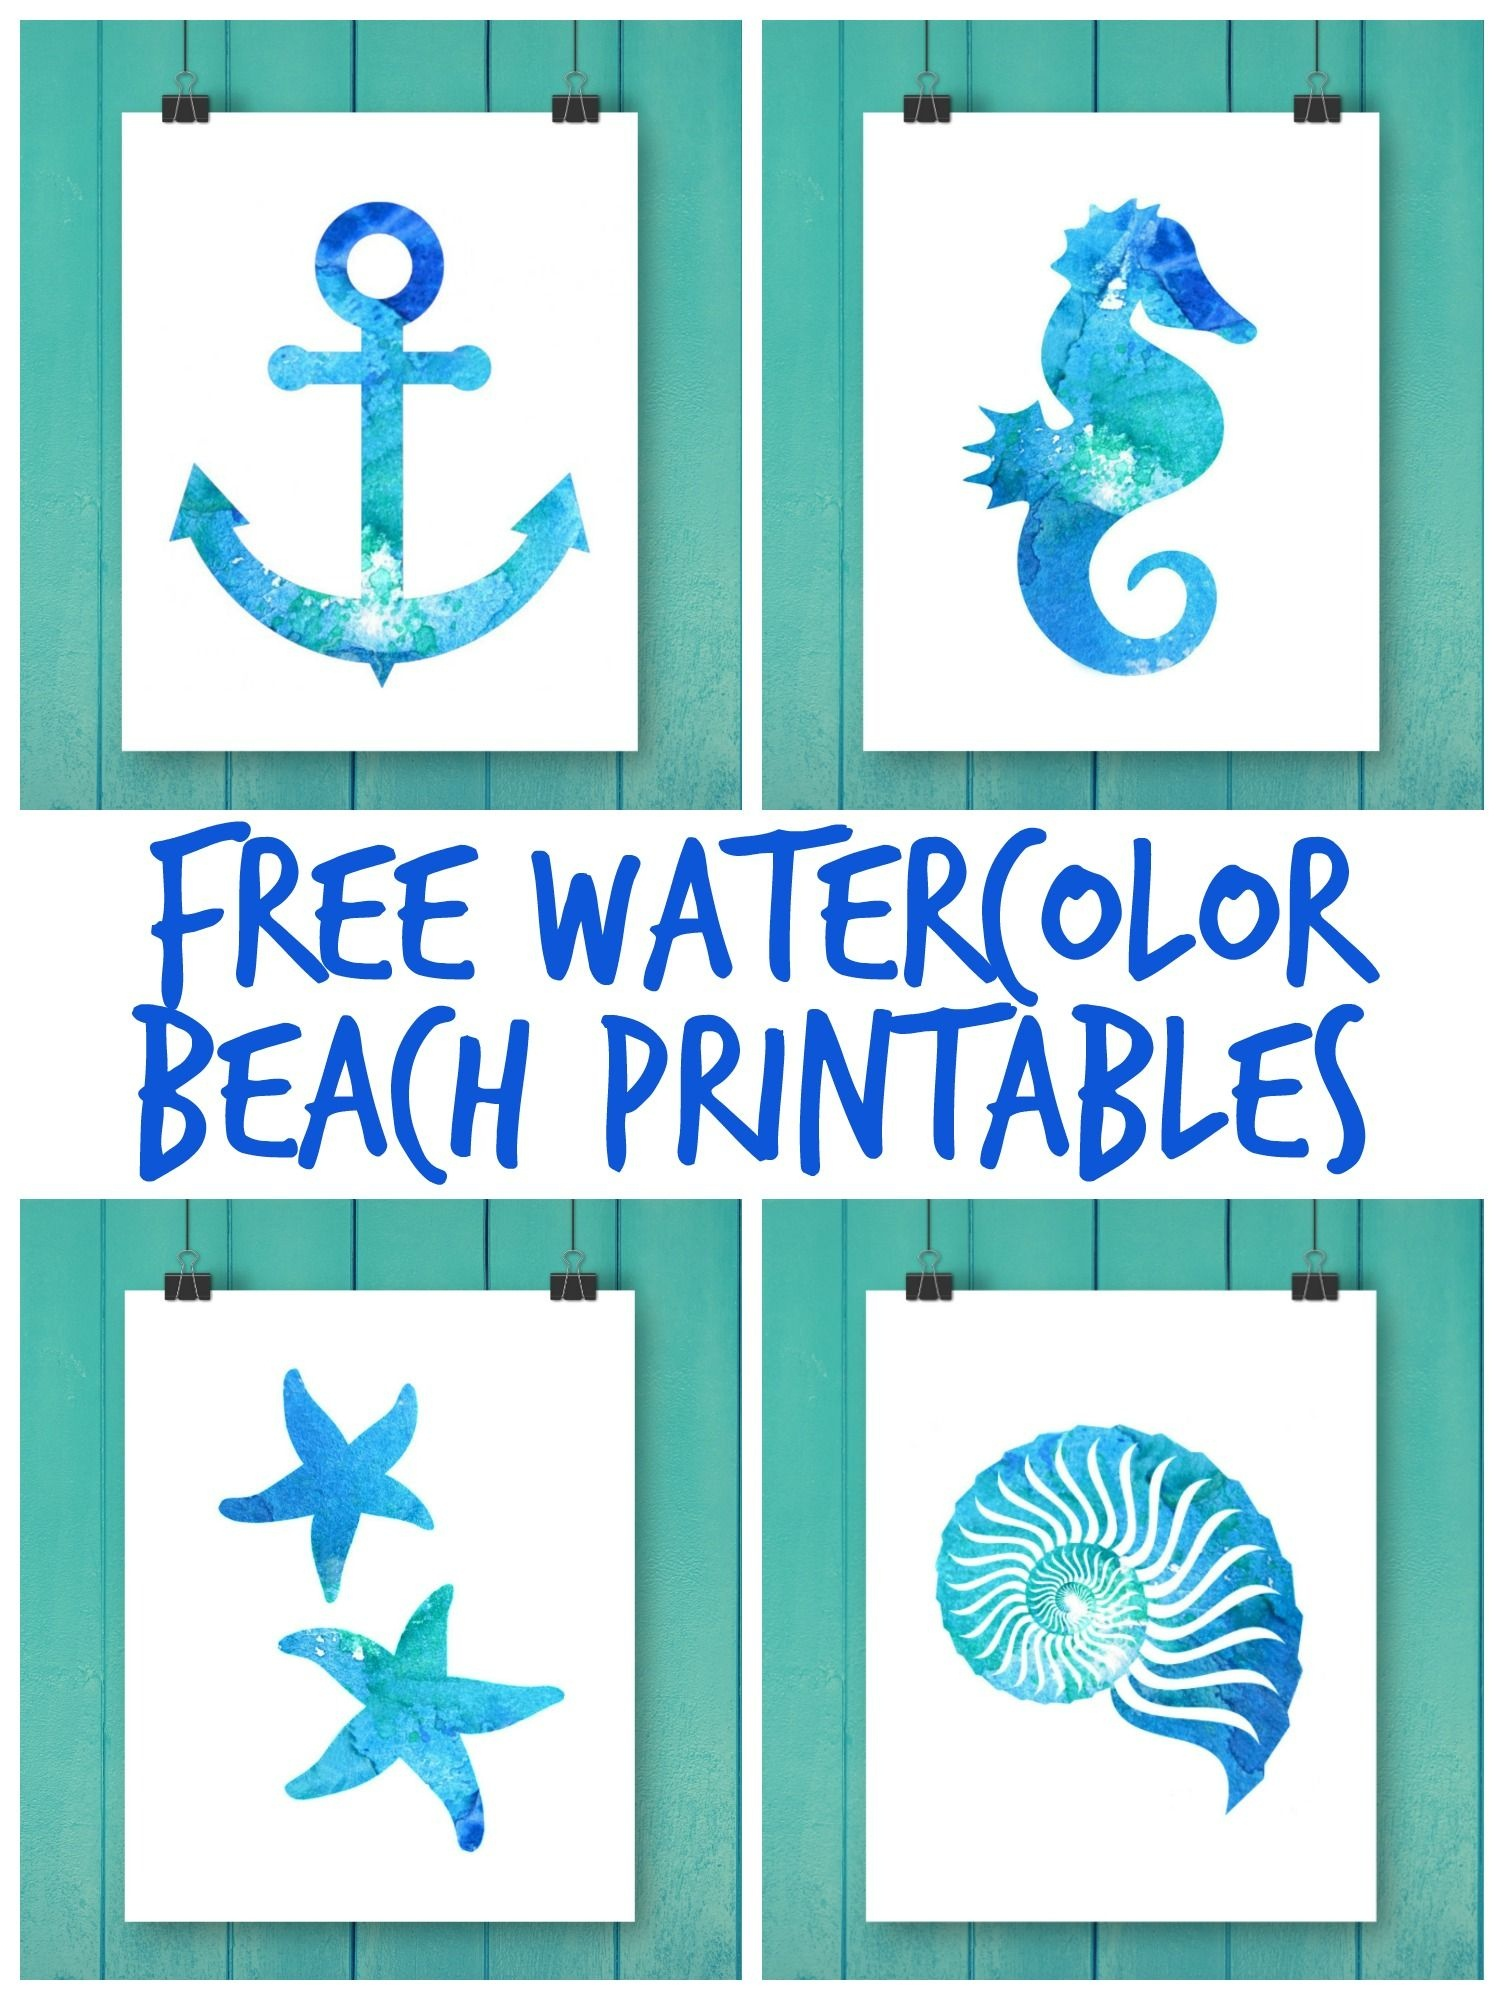 Free Watercolor Beach Printables | Printable Art | Beach Watercolor - Free Printable Beach Pictures